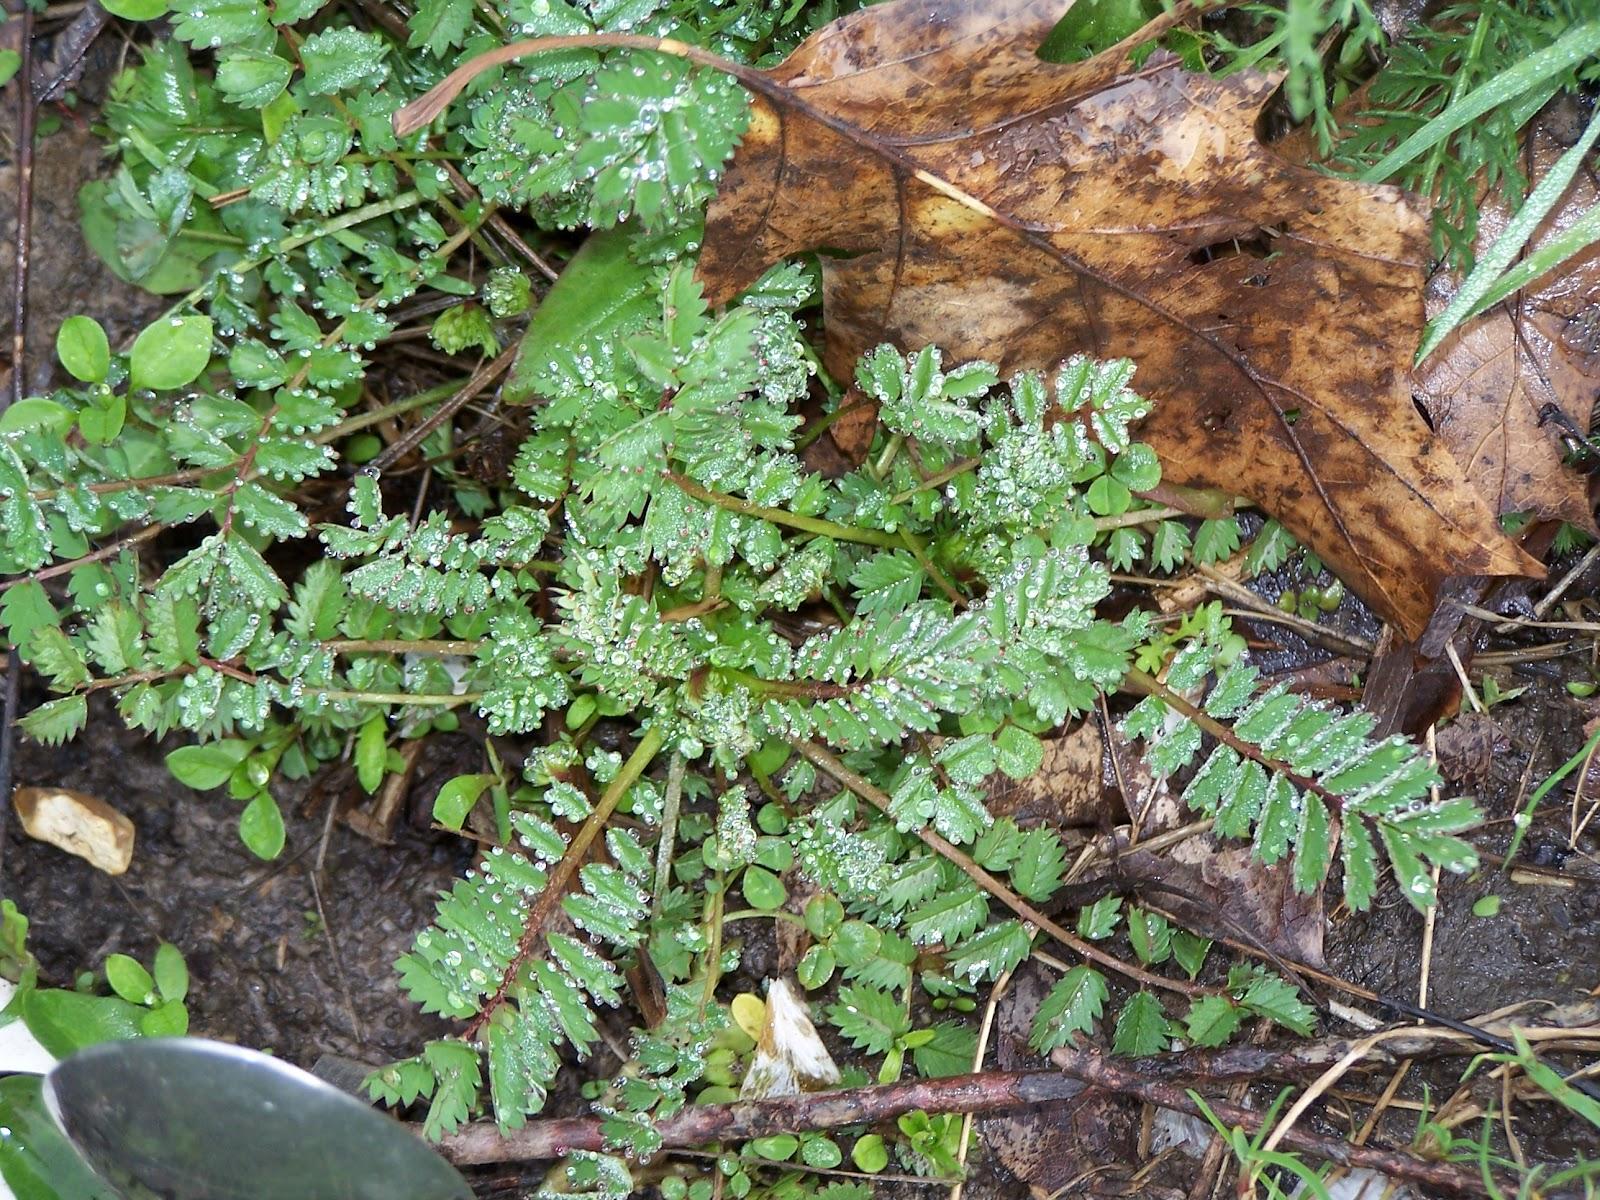 Ecolo bio nature permaculture urbaine et jardinage bio for Plante jardin